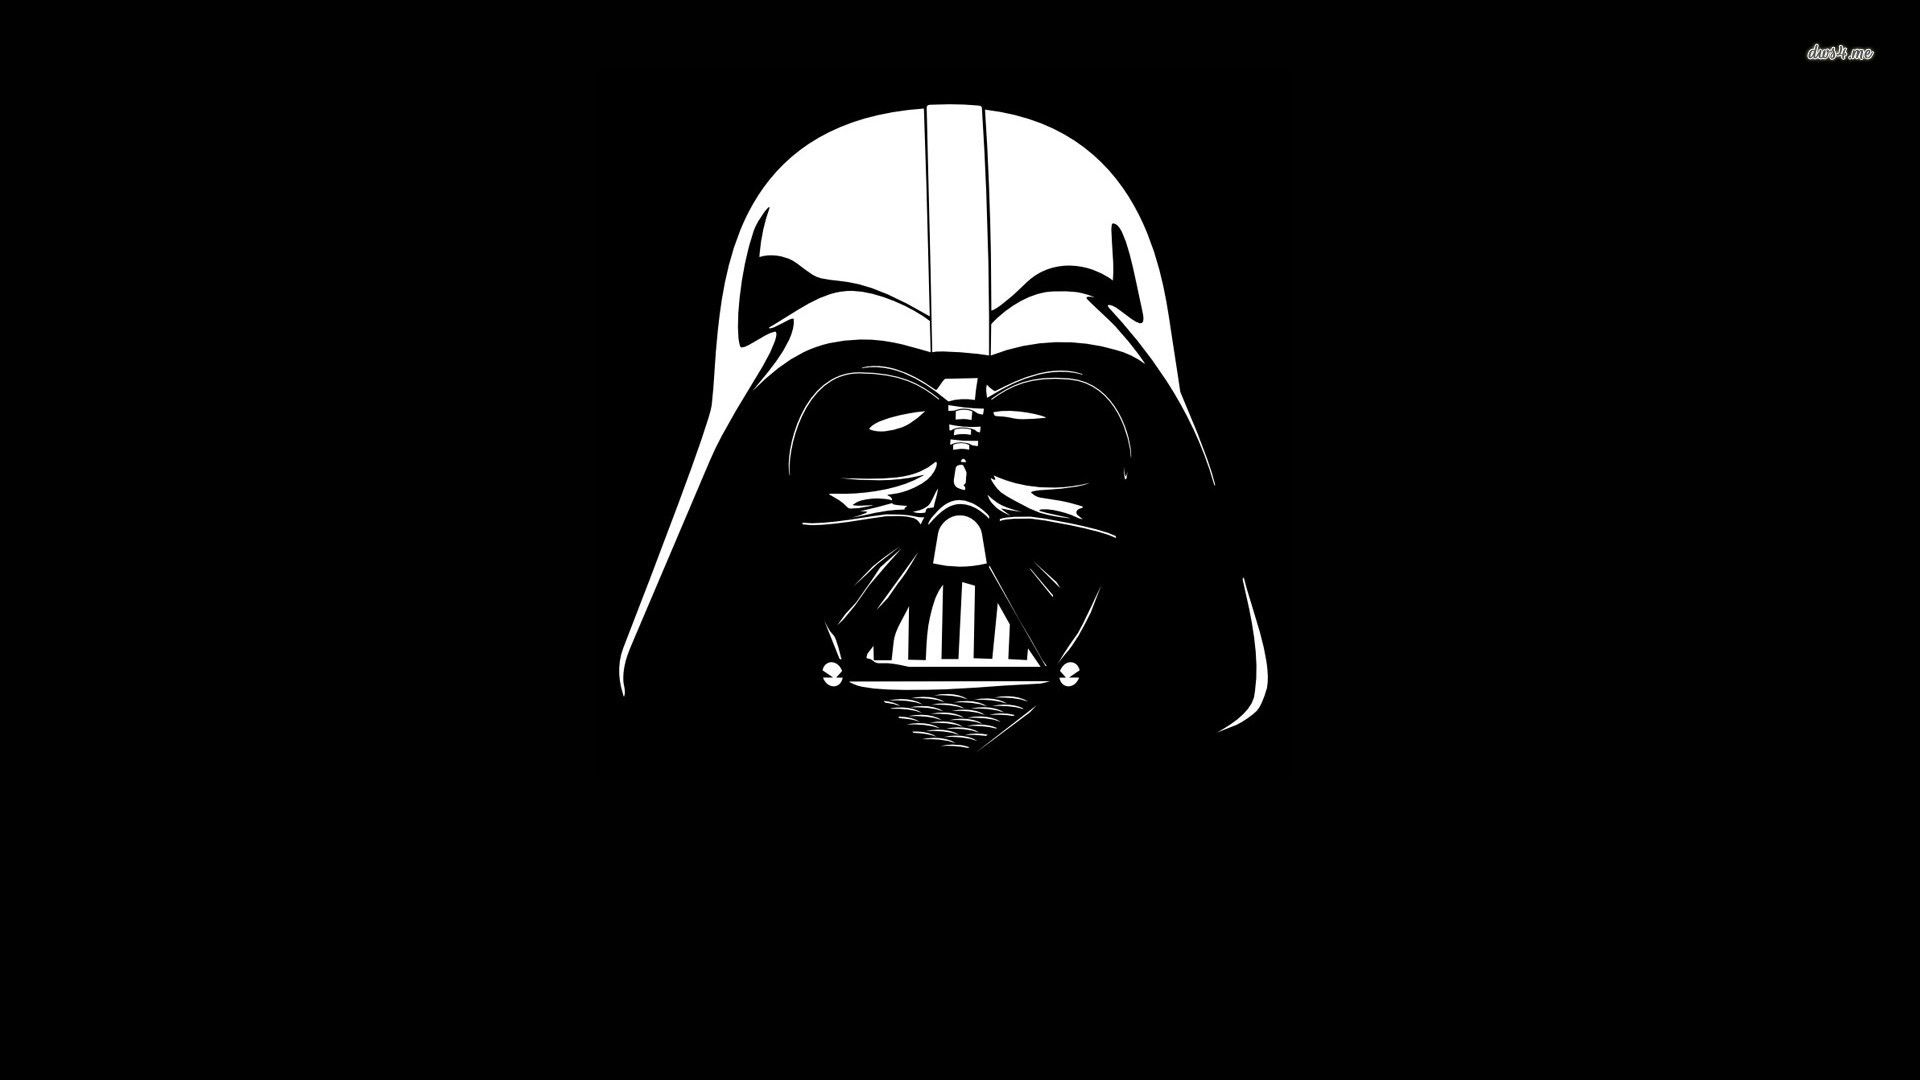 Star Wars Darth Vader Wallpapers Desktop Background Movies Darth Vader Hd Wallpaper Darth Vader Wallpaper Star Wars Awesome